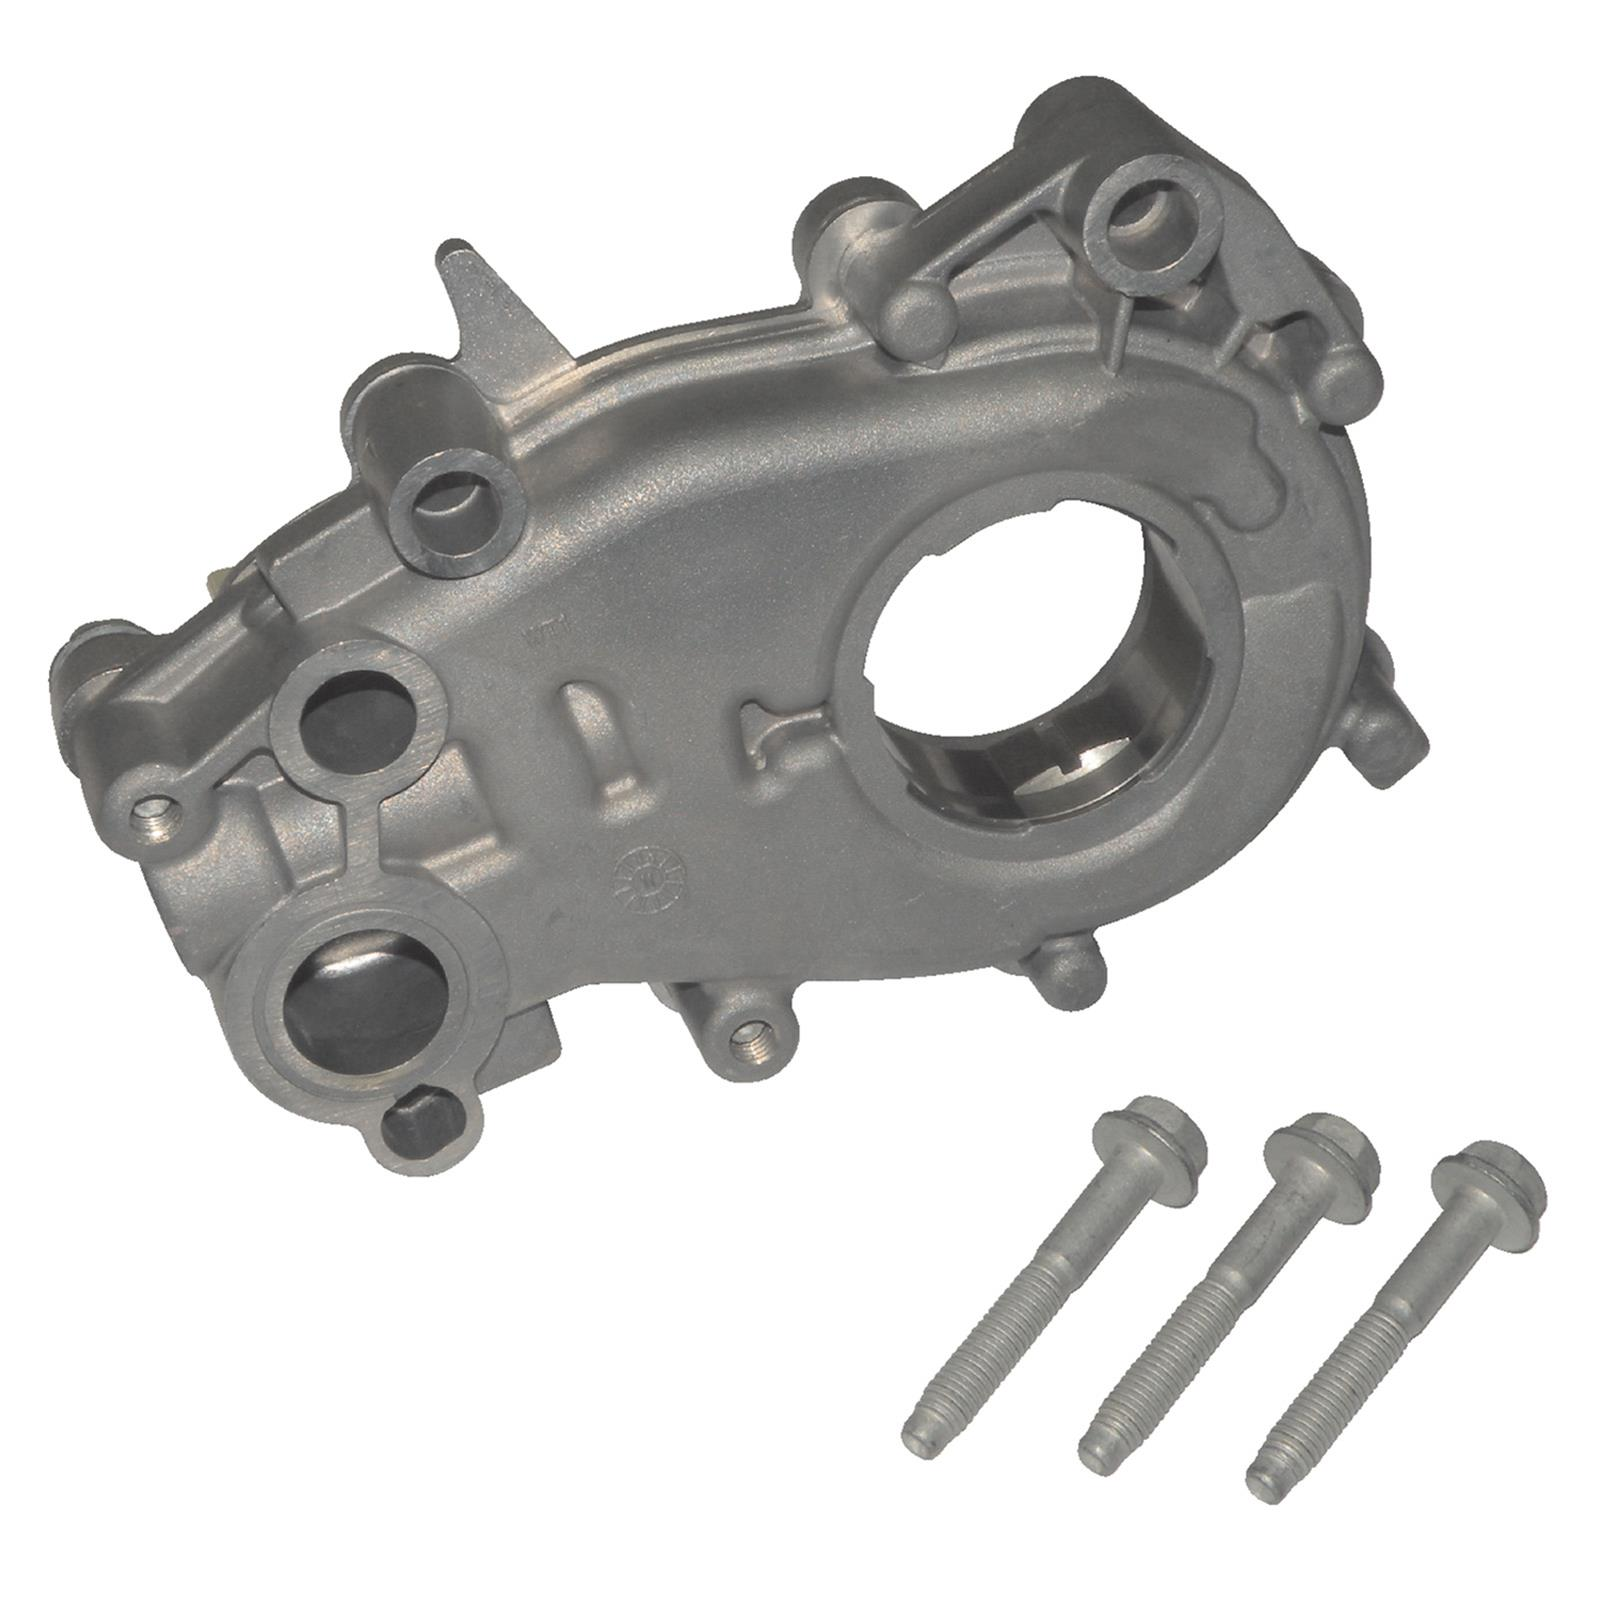 Melling M331 Oil Pump